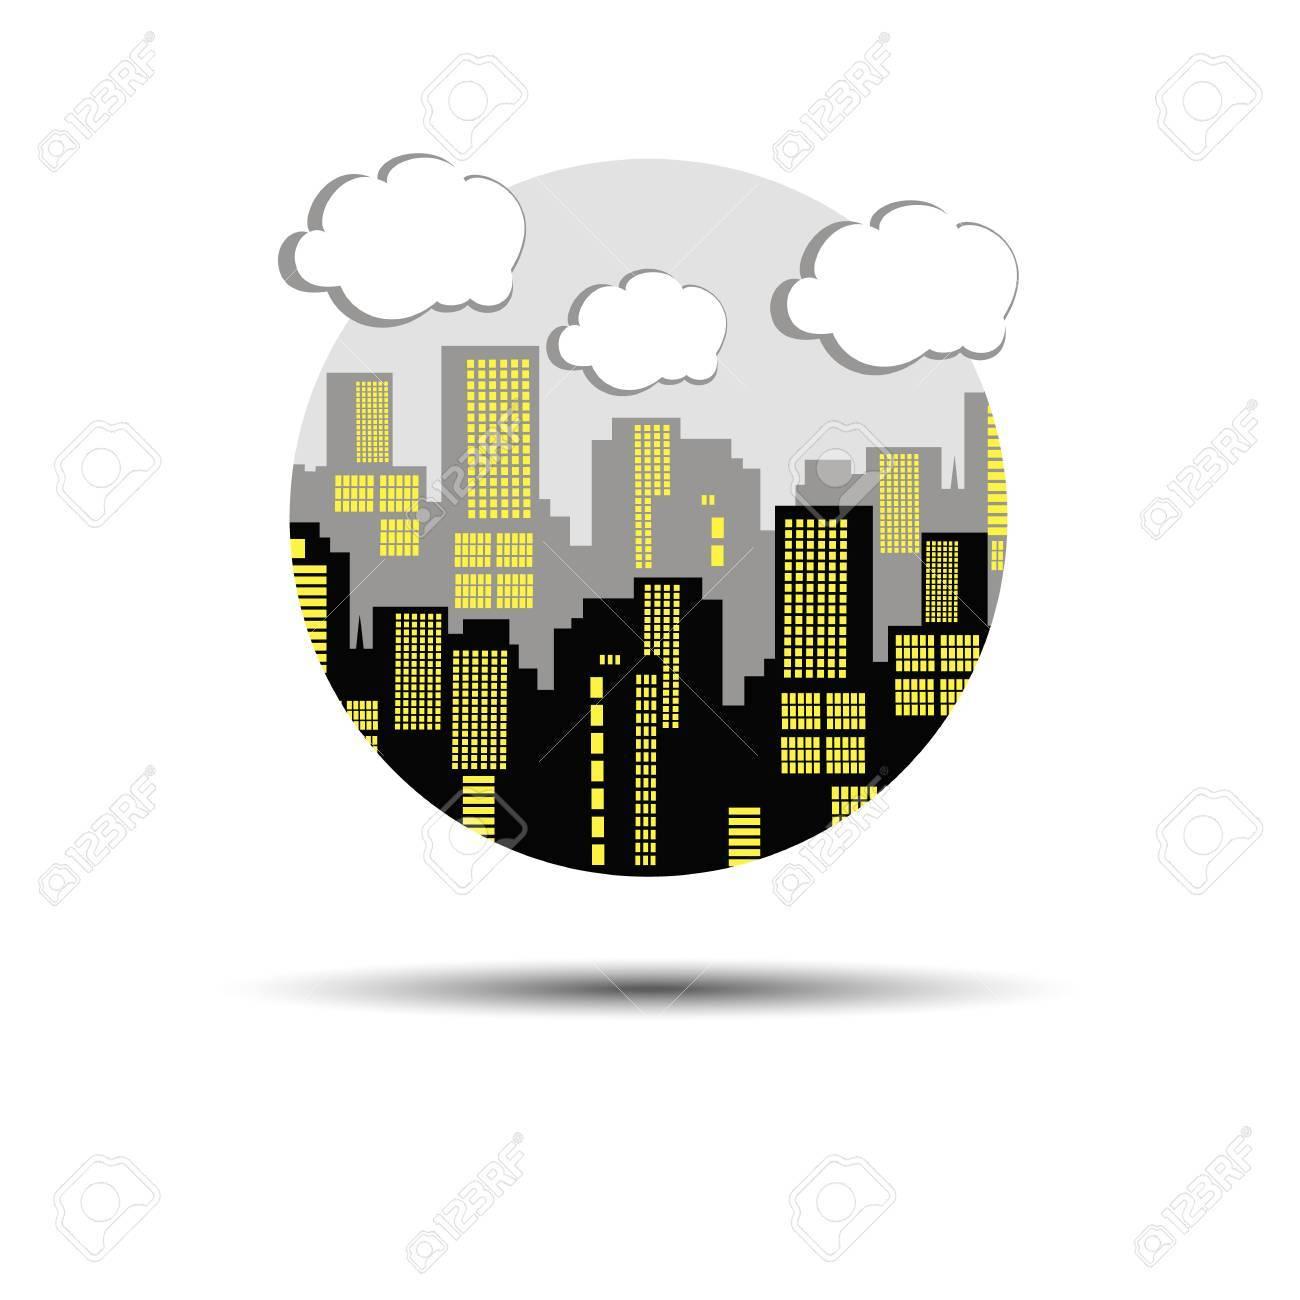 Ciudad Silueta Vector Arquitectura Paisaje Urbano Resumen ...